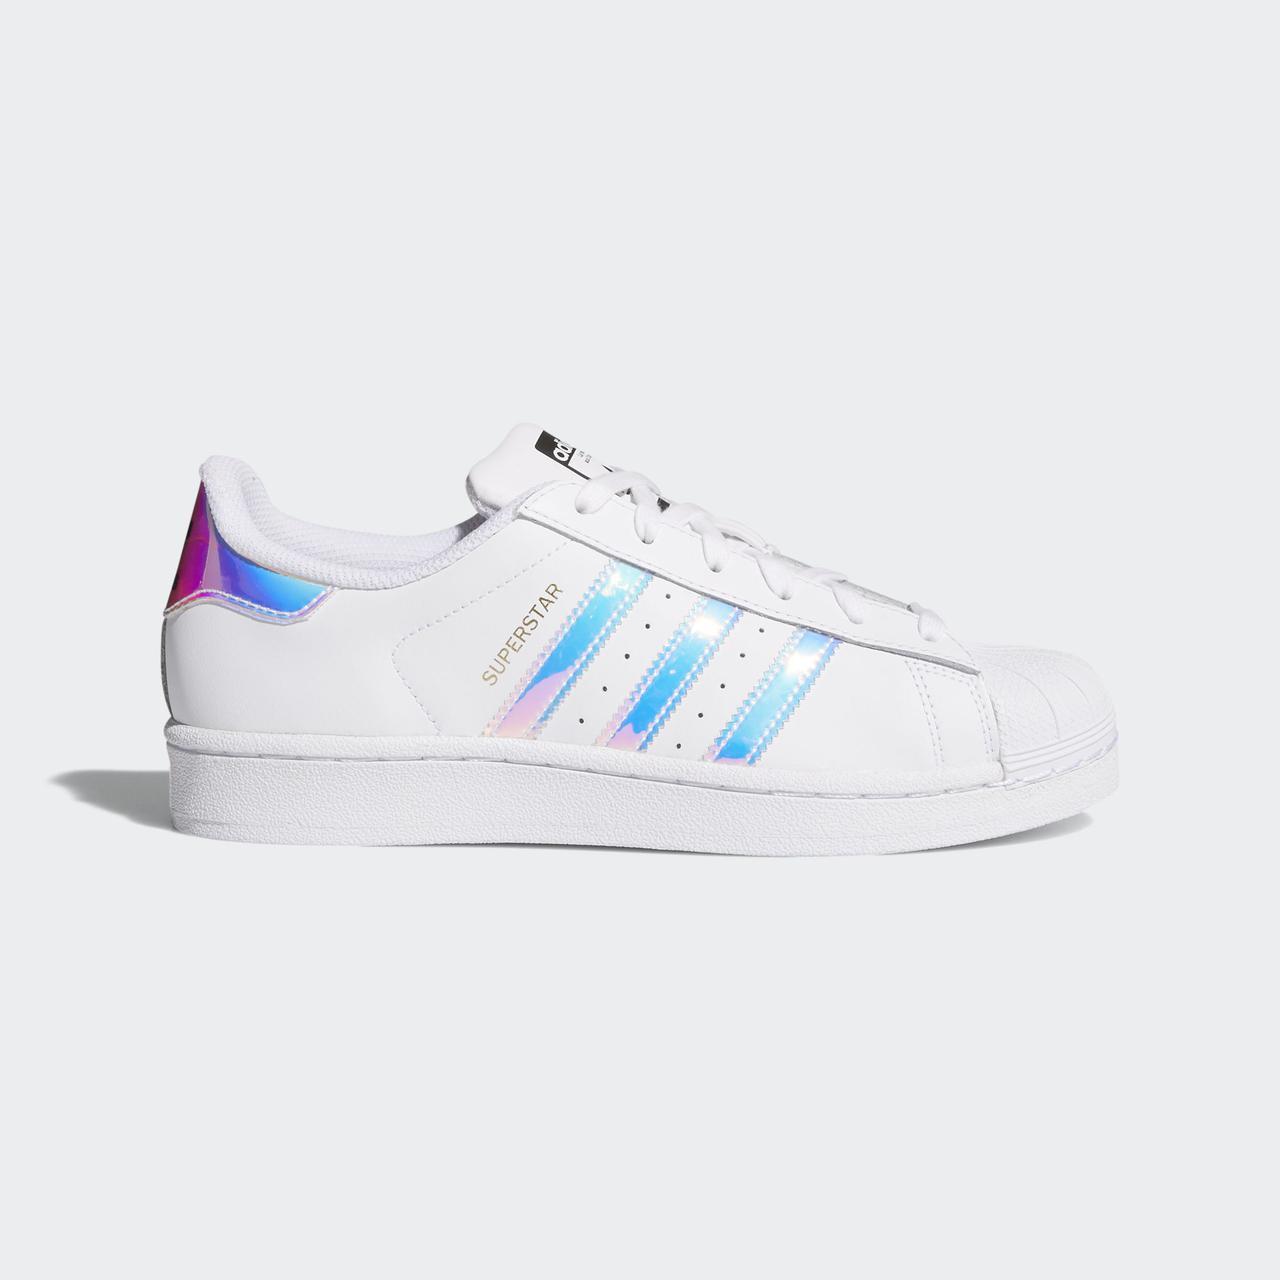 19bcaa6f Купить Детские кроссовки Adidas Originals Superstar (Артикул: AQ6278 ...